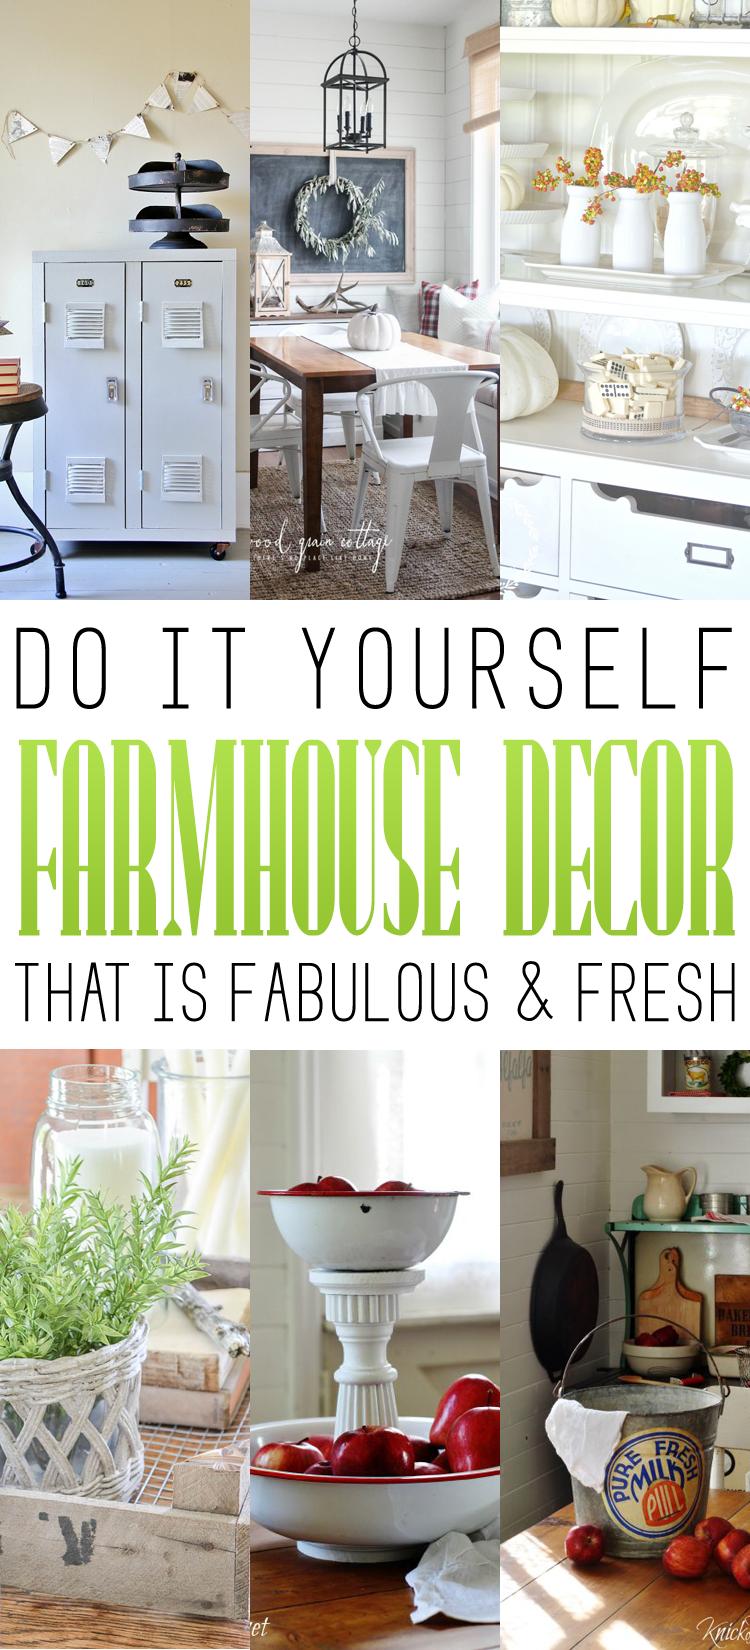 DIY Farmhouse Decor that is fabulous and